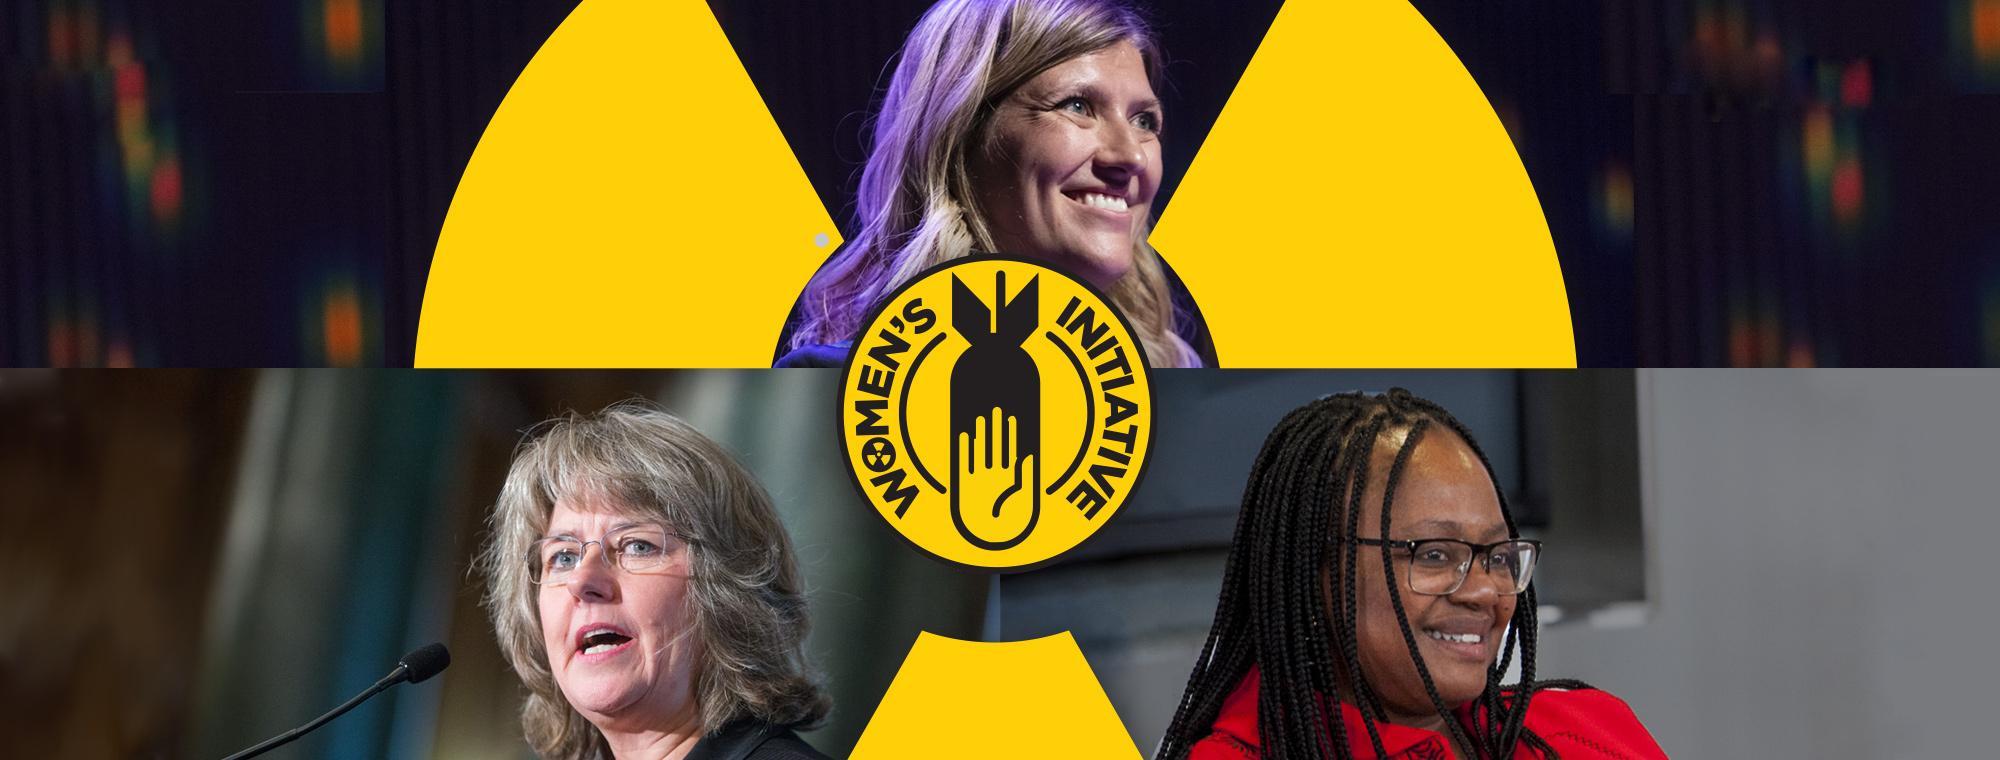 3 women preventing nuclear war